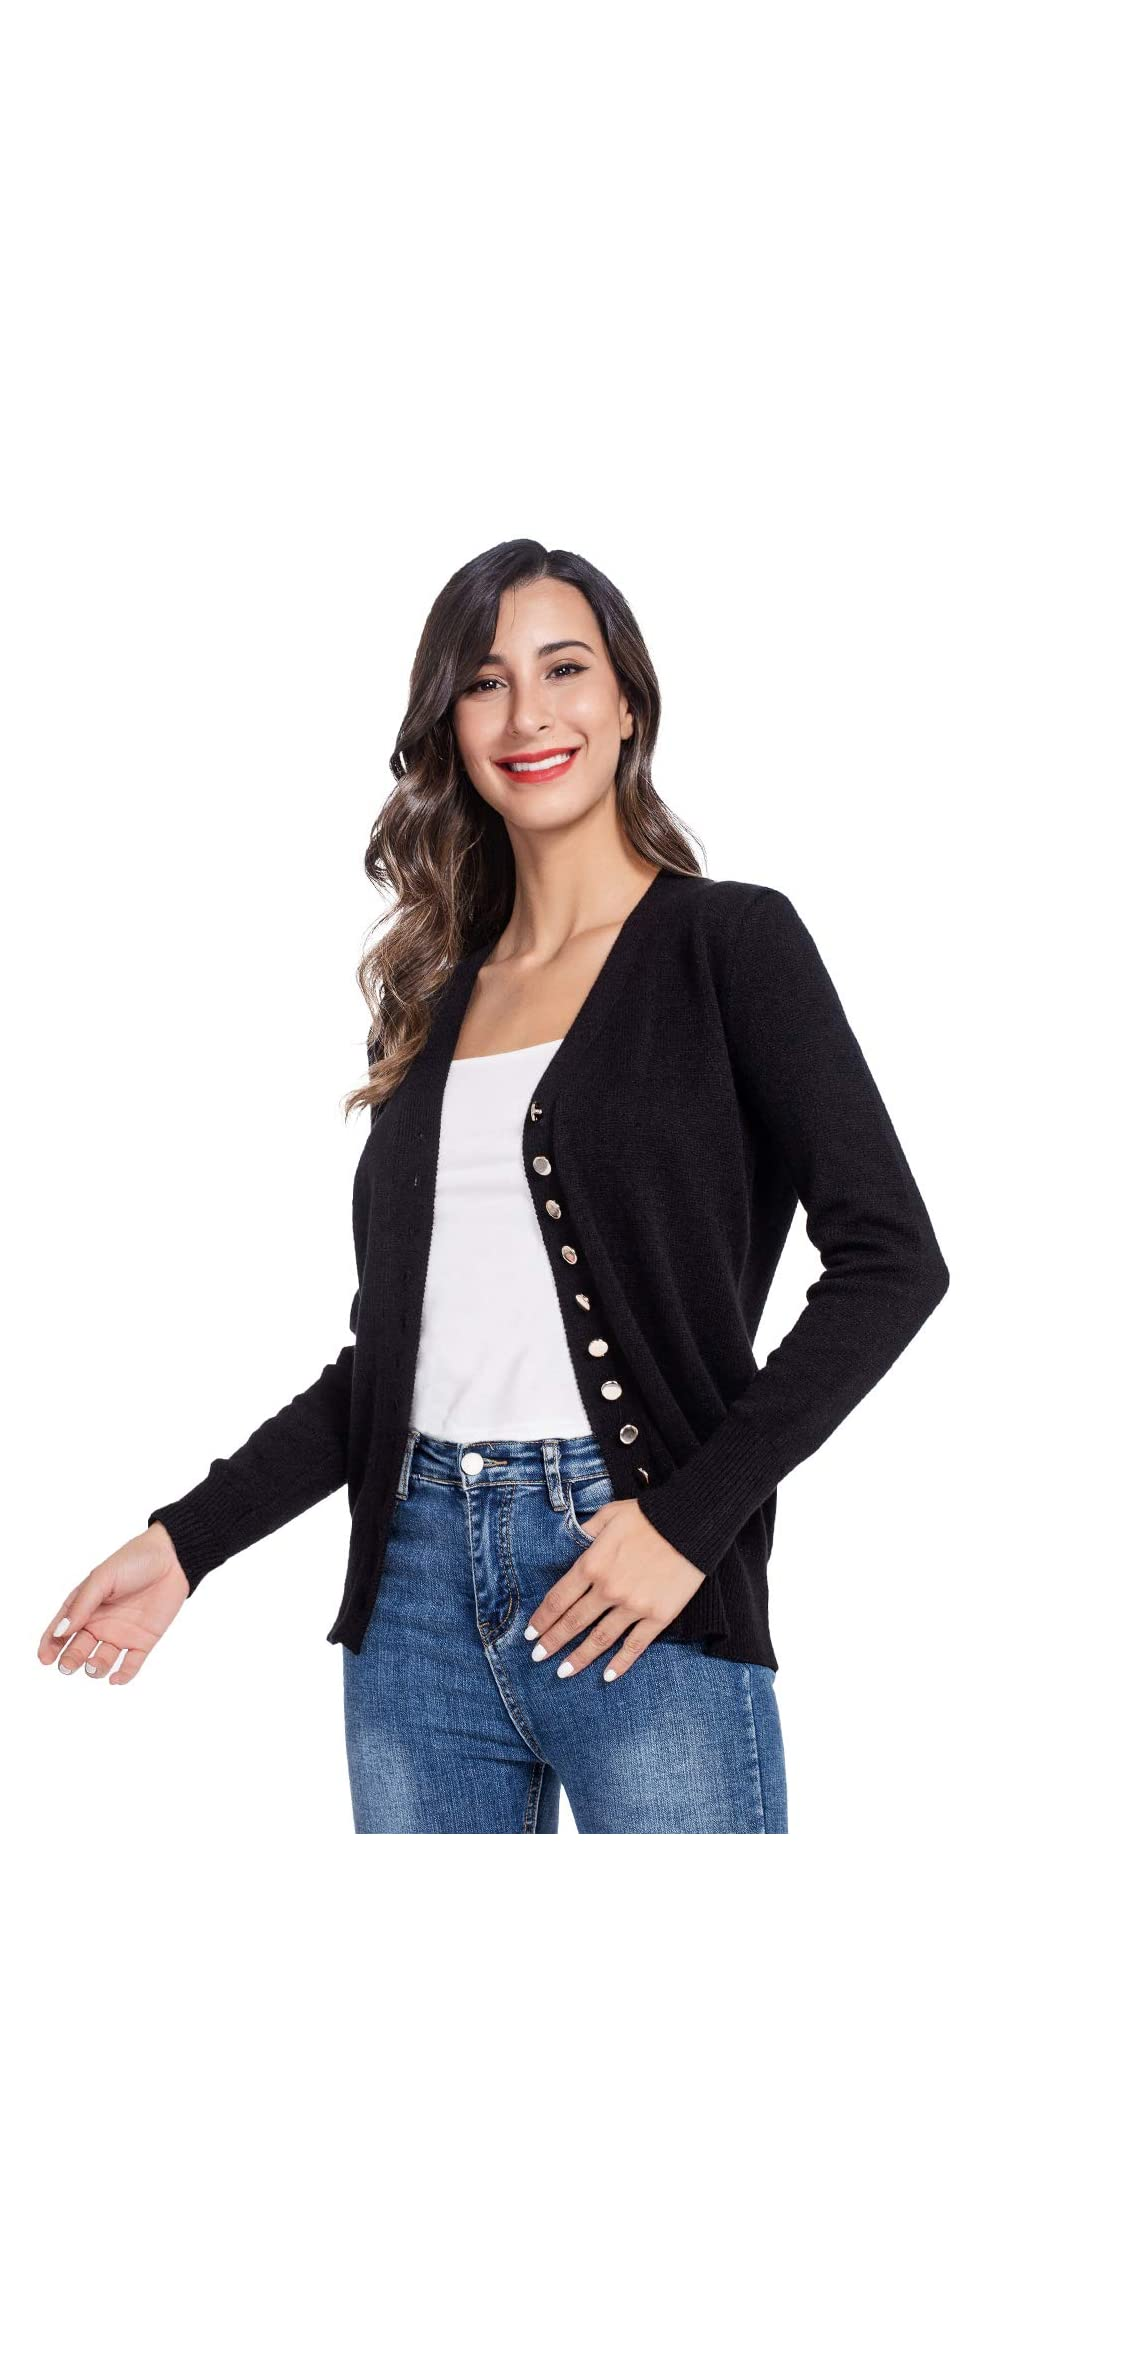 Women Open Front Cardigans Sweaters Long Sleeve Casual